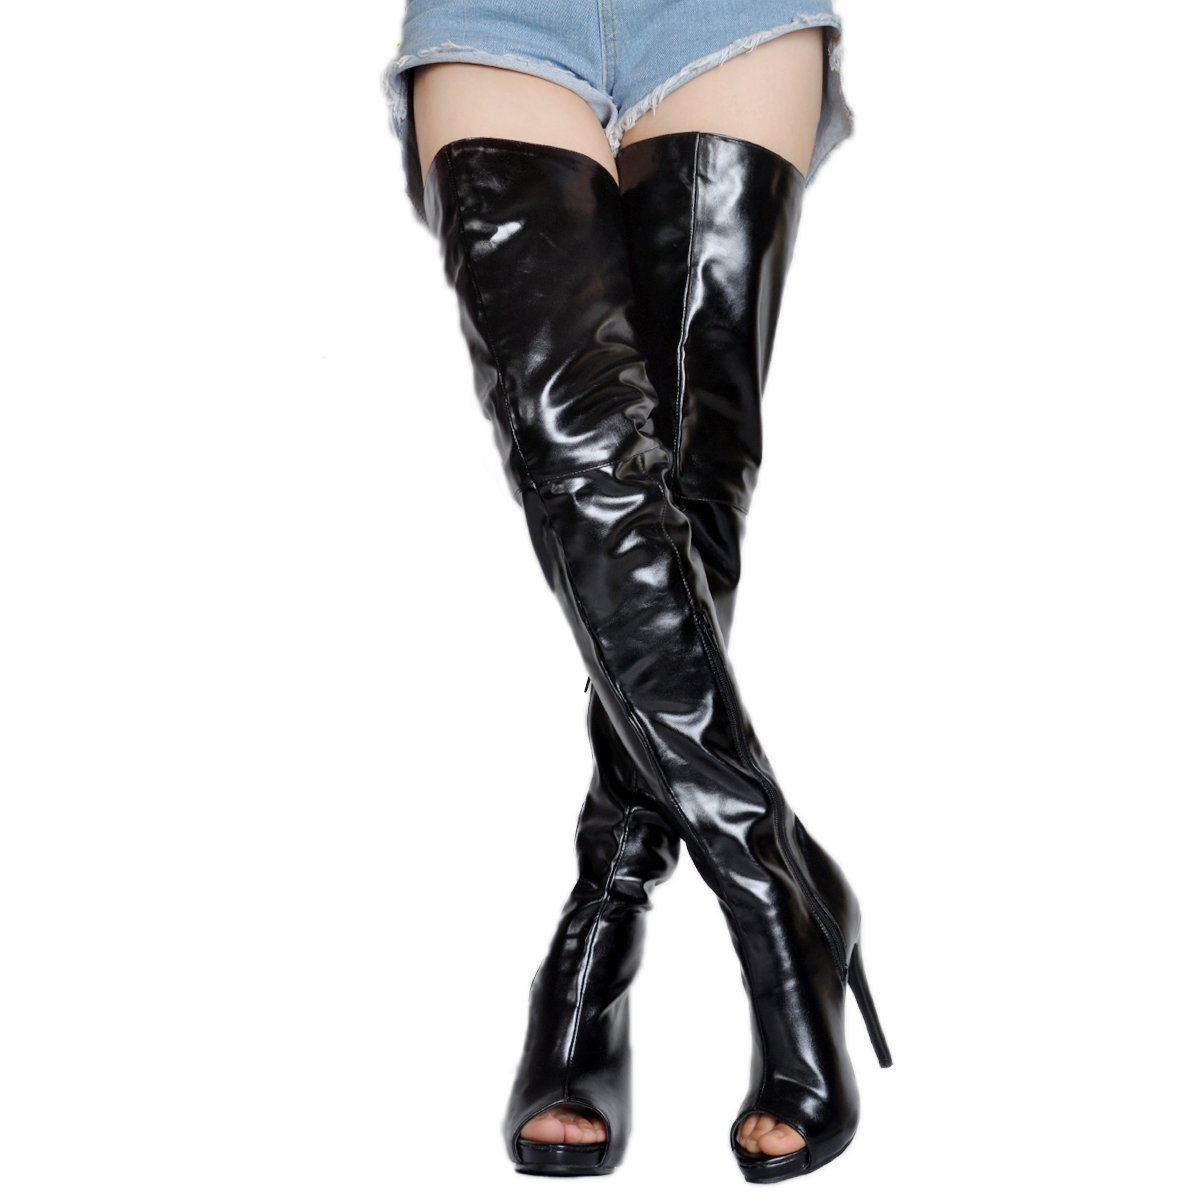 Kolnoo Damen Damen Damen BFCM Handgemachte High Heel Stiefel Peep-Toe Sexy Oberschenkel Stiefel Mode Schuhe 1c5076